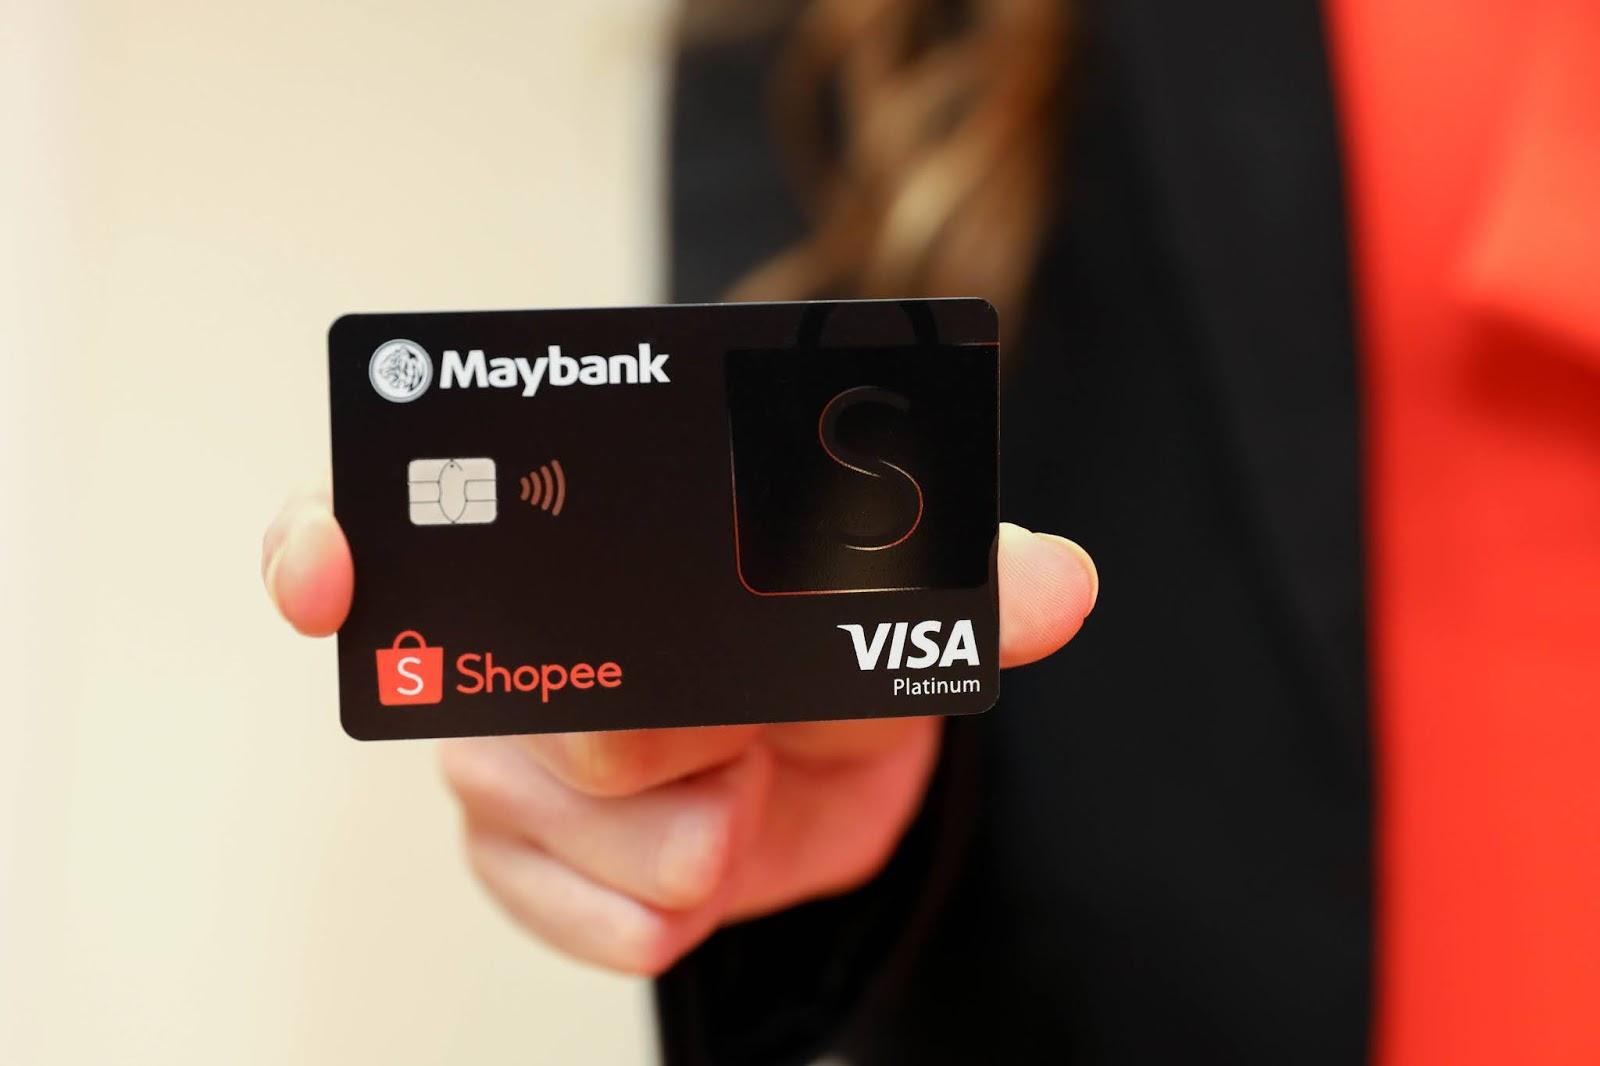 Maybank Shopee Credit Card